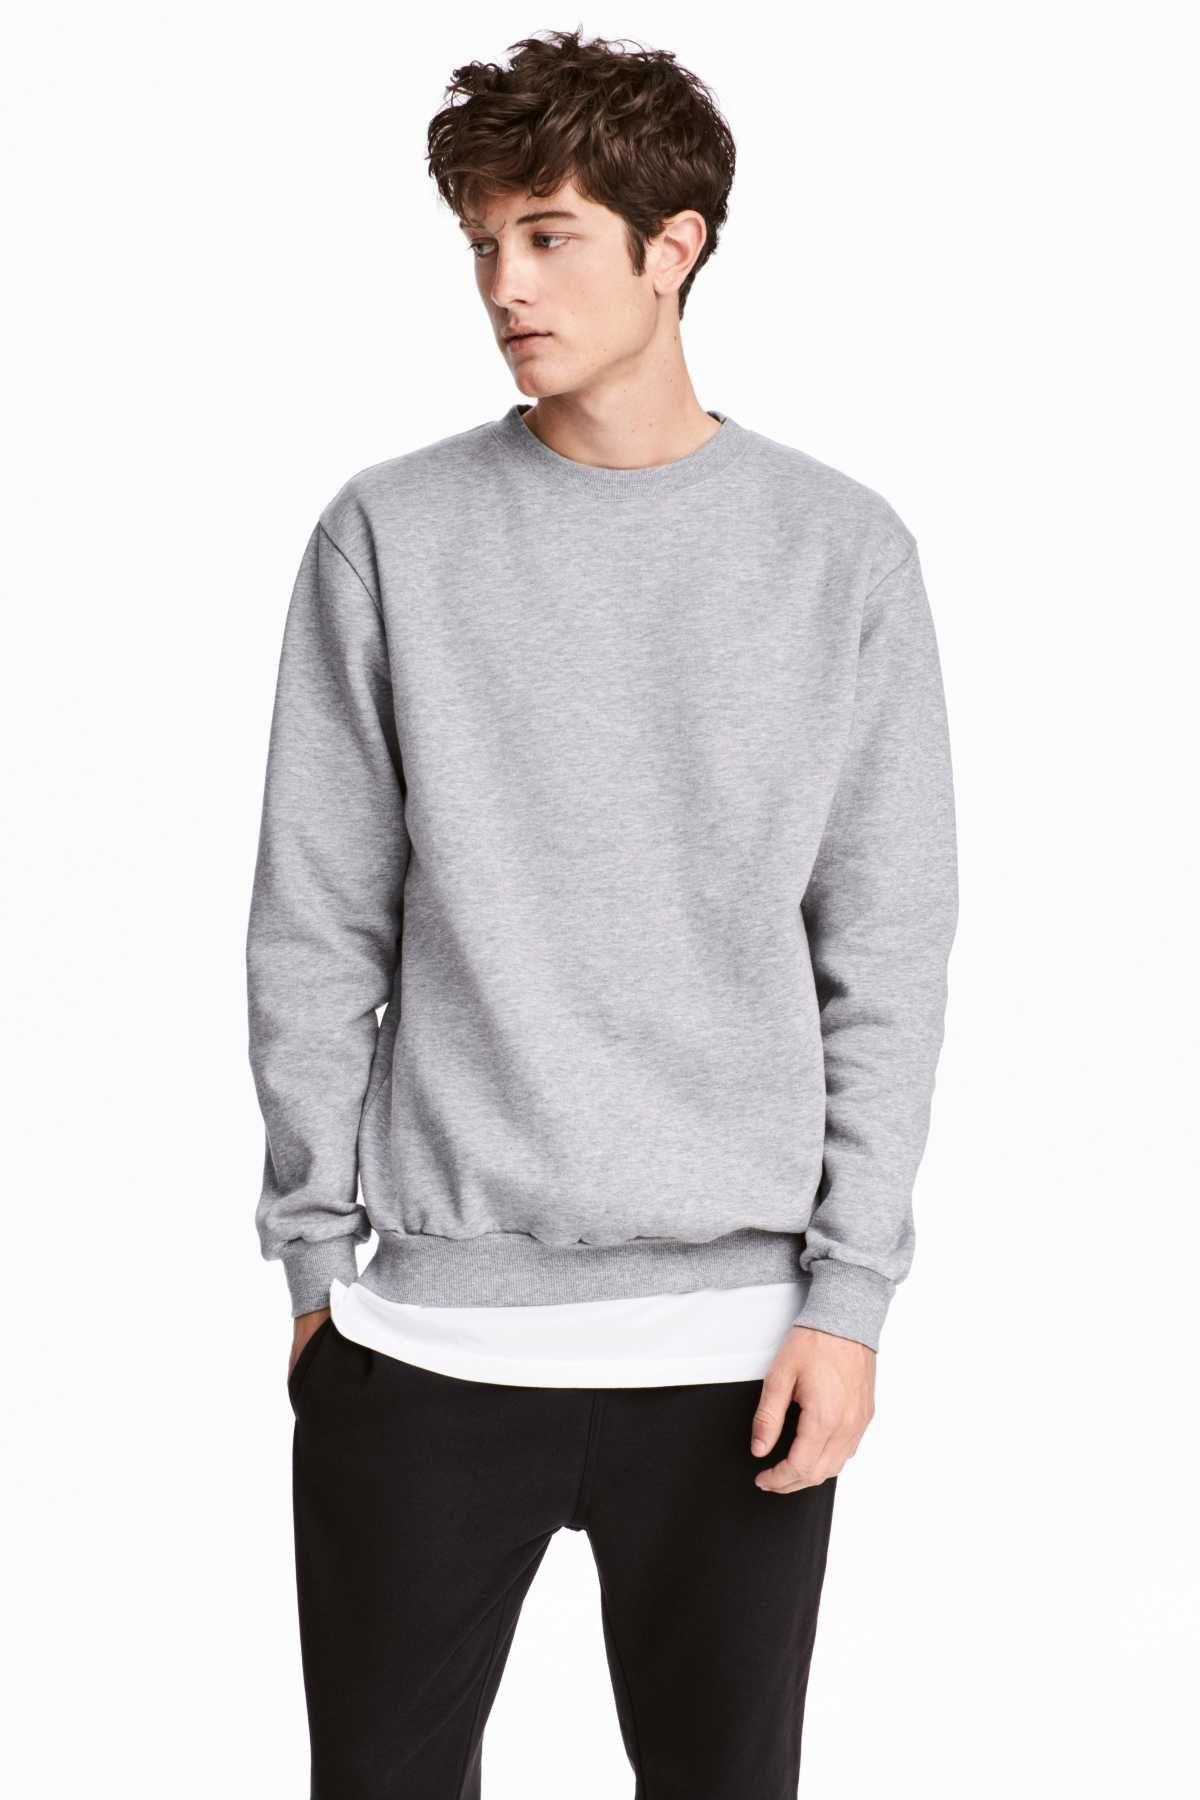 9ab3d081 Relaxed-fit Sweatshirt | Gray melange | MEN | H&M US | Character ...